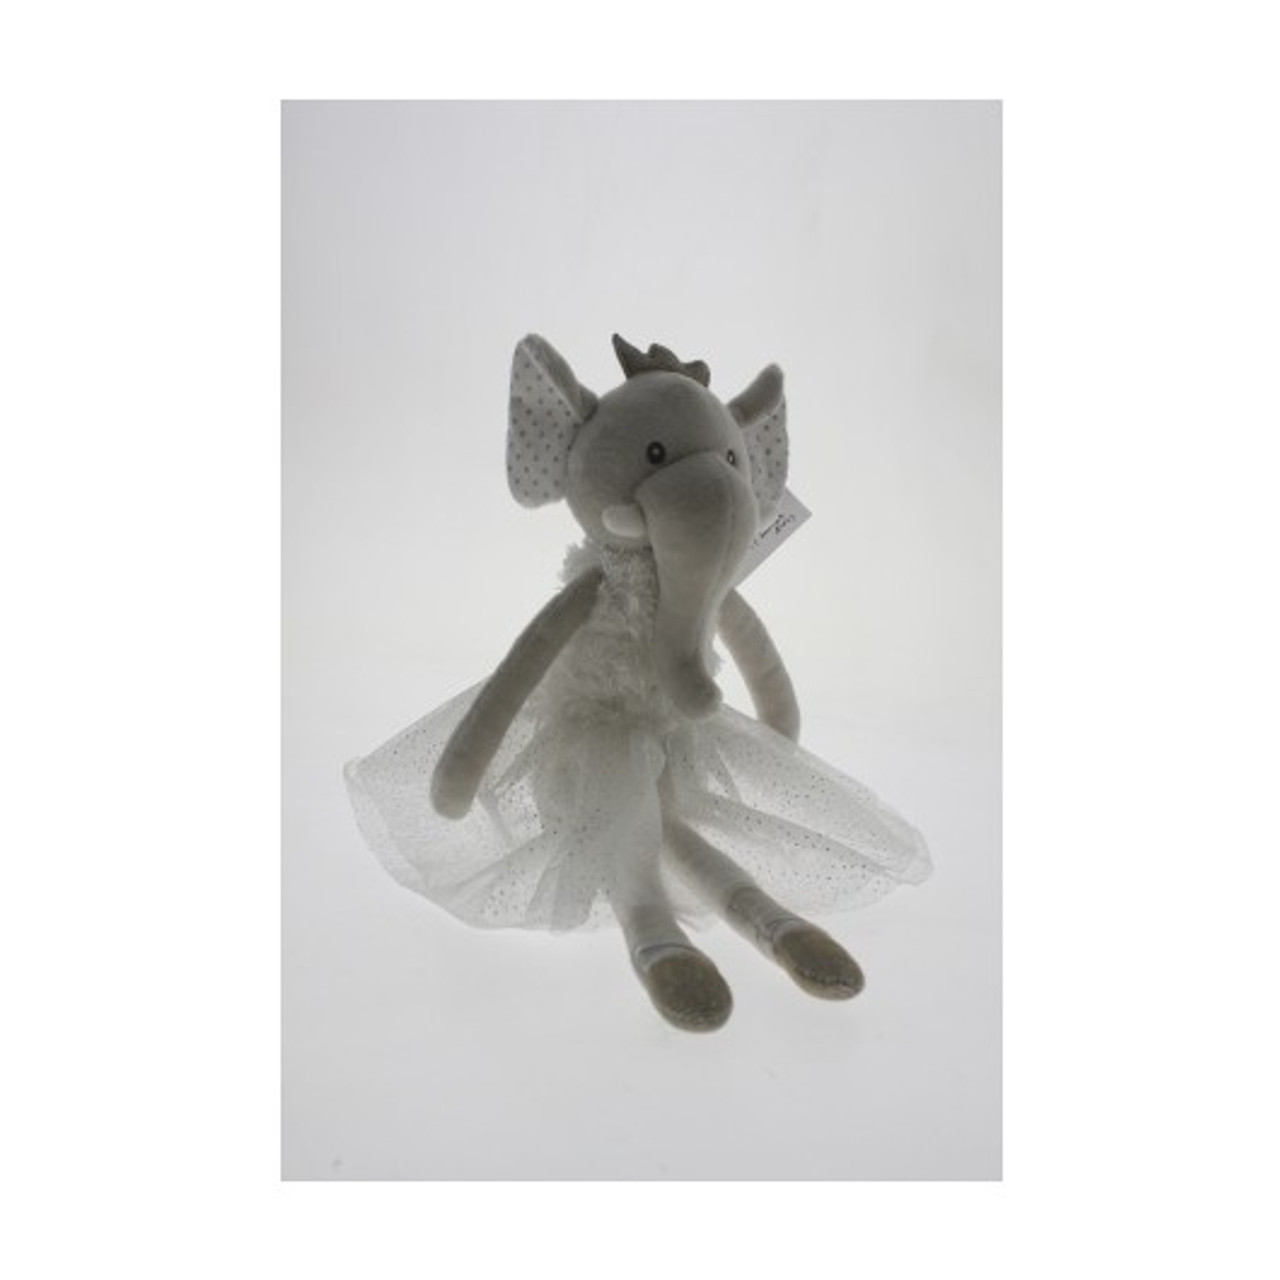 RR03 35cm Elephant Ballerina Plush